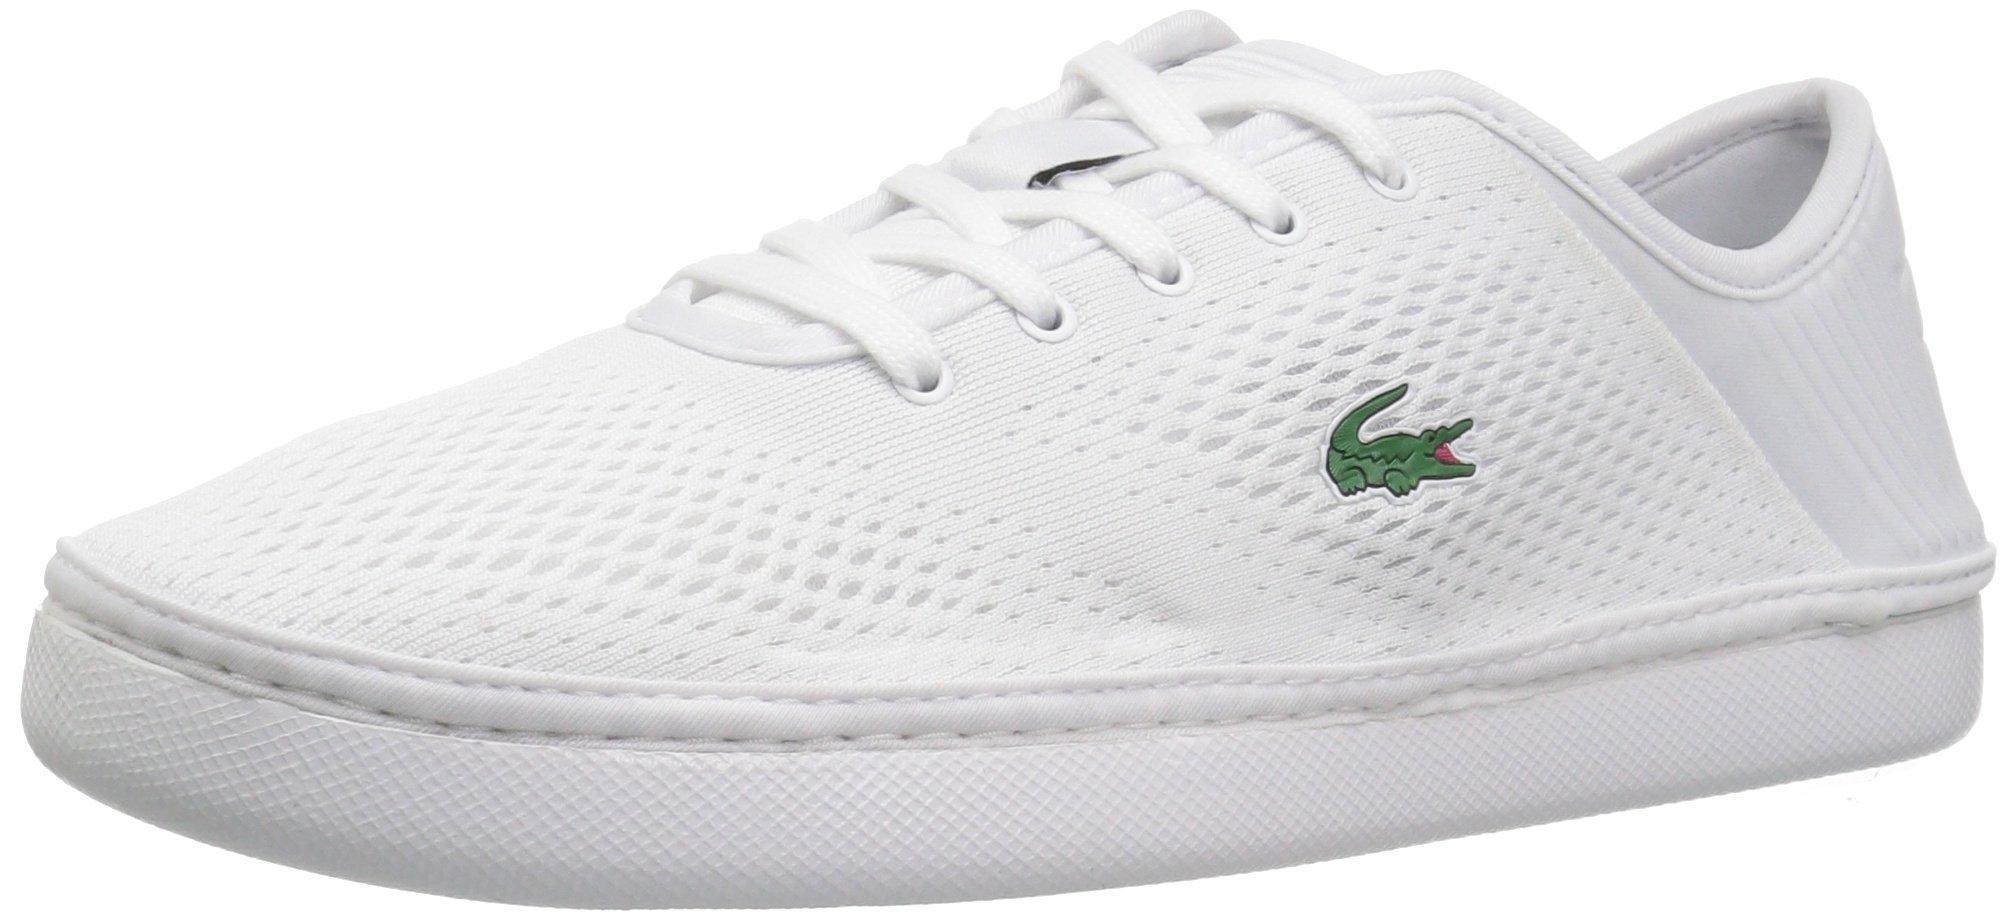 Lacoste Men's L.ydro Lace Sneakers,White/White Textile,12 M US